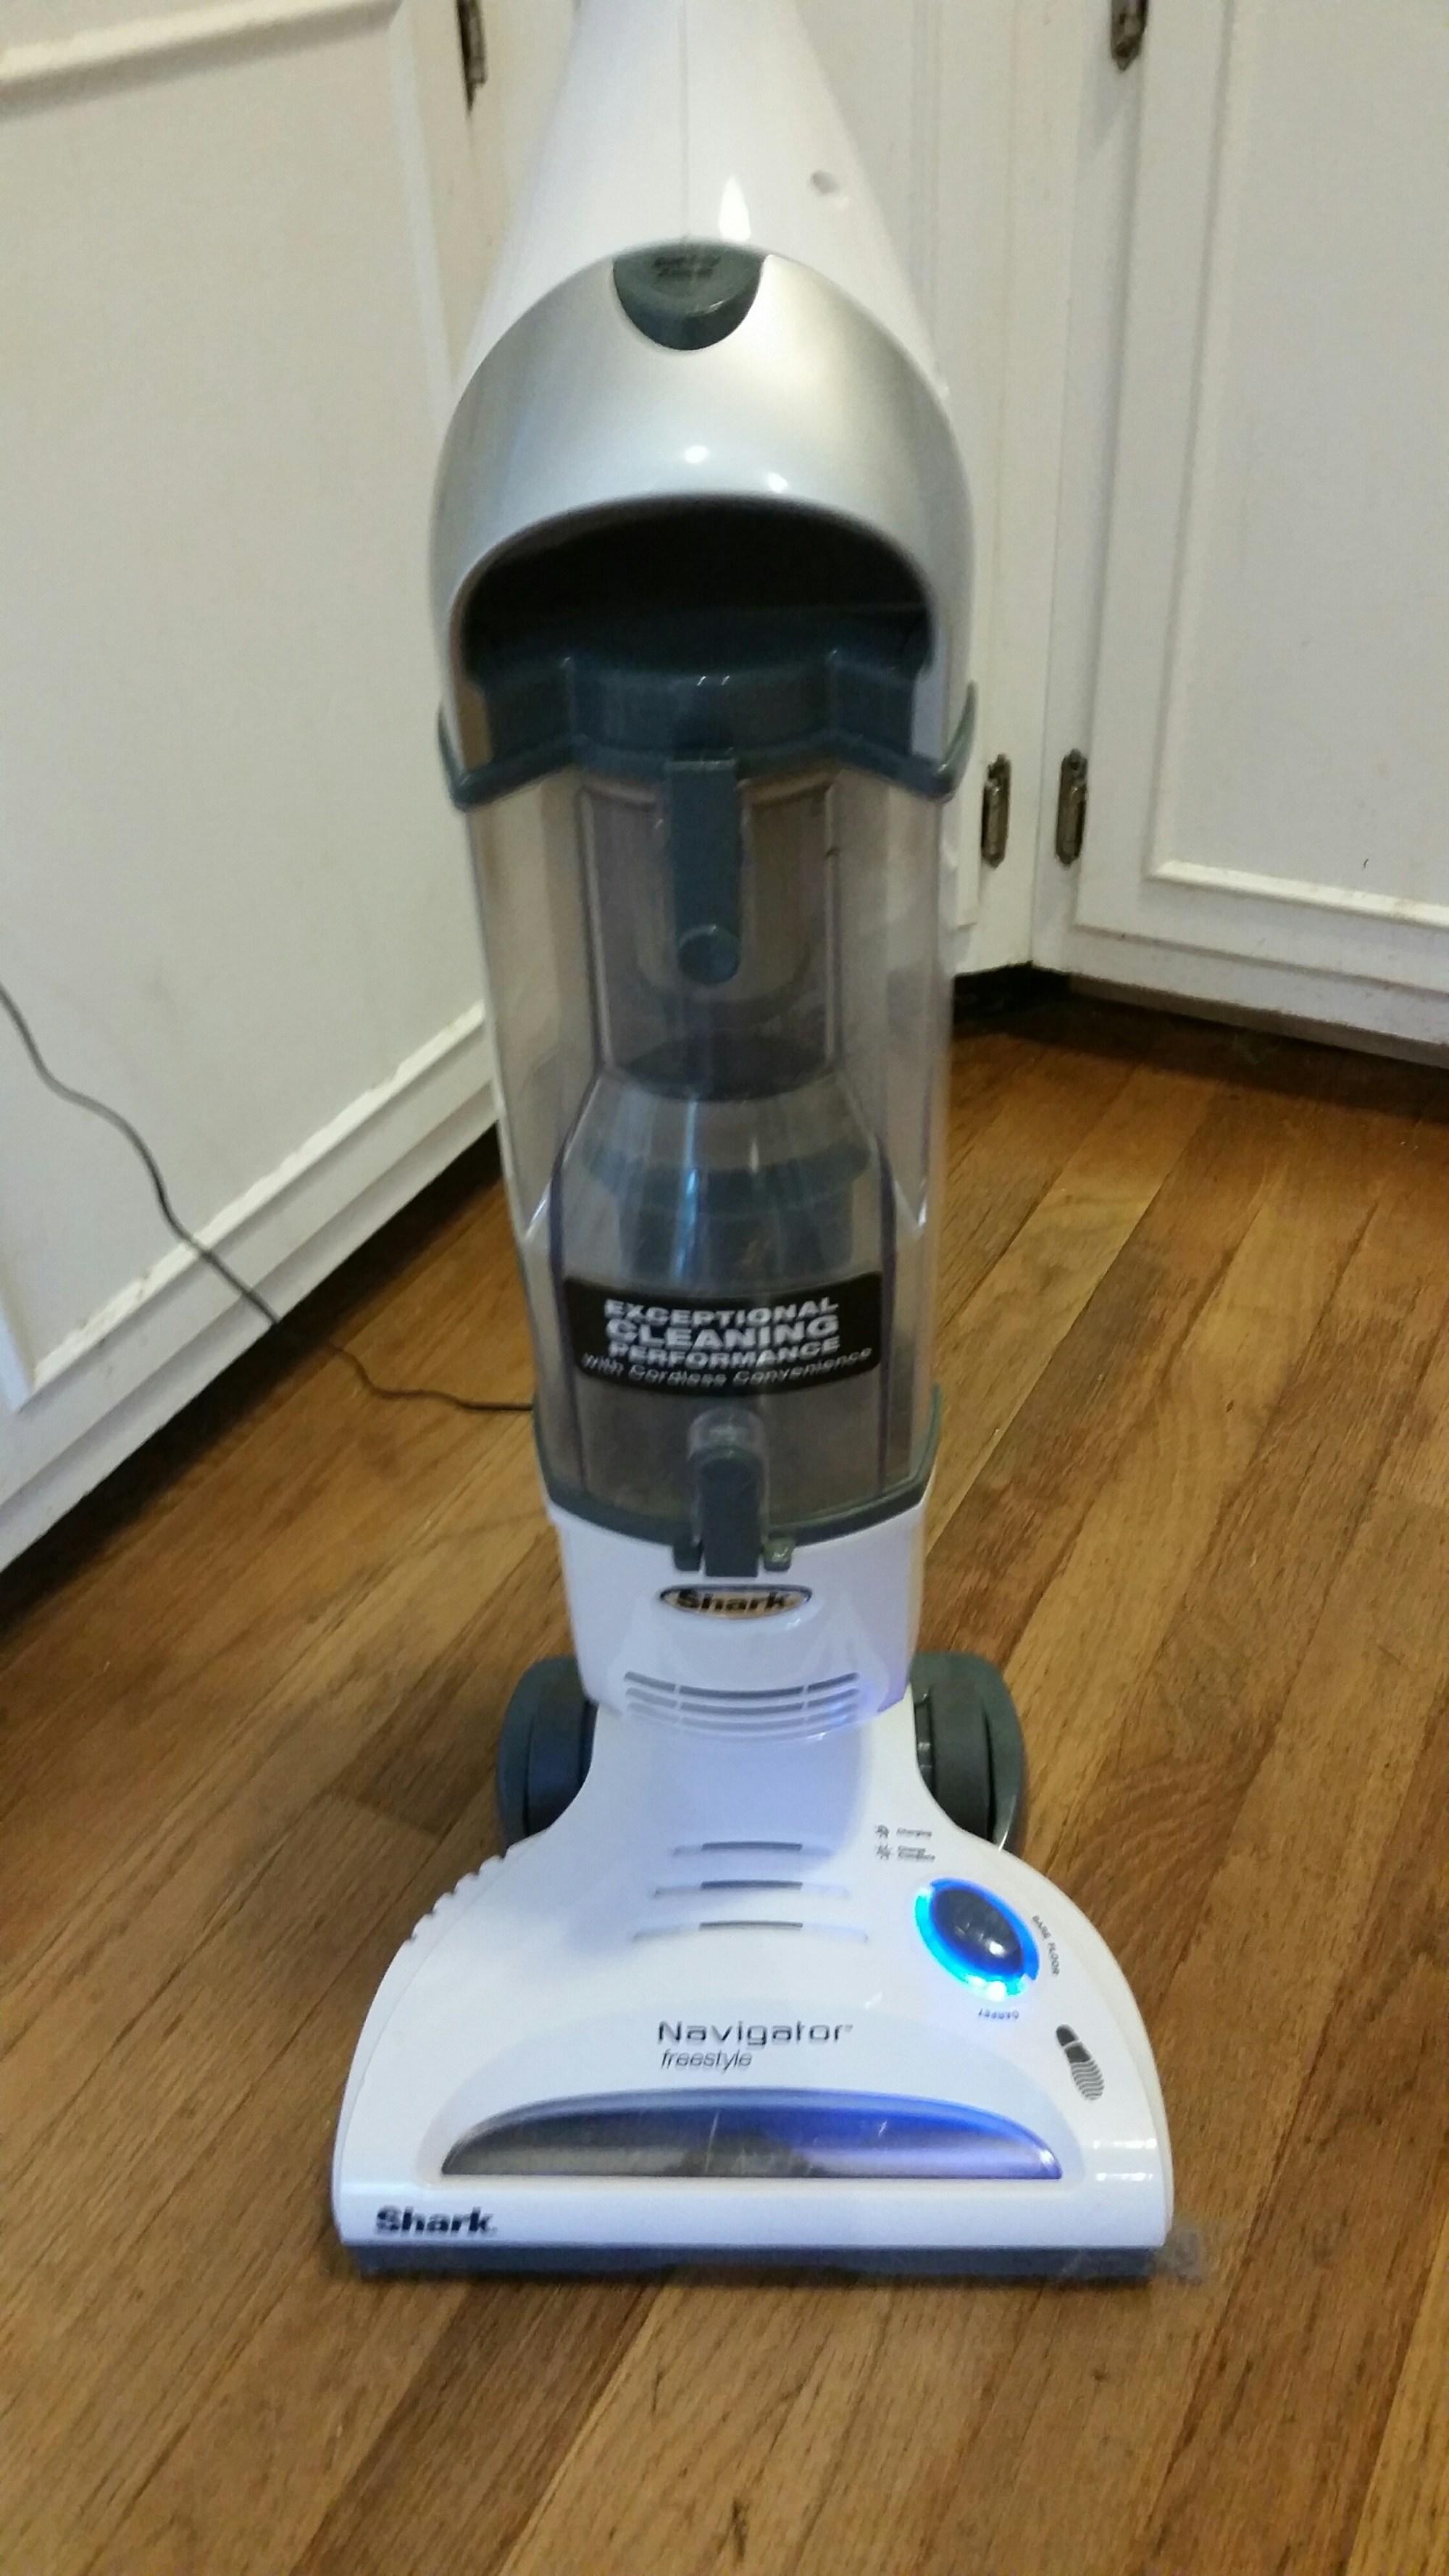 hight resolution of photos of shark vacuum reviews navigator